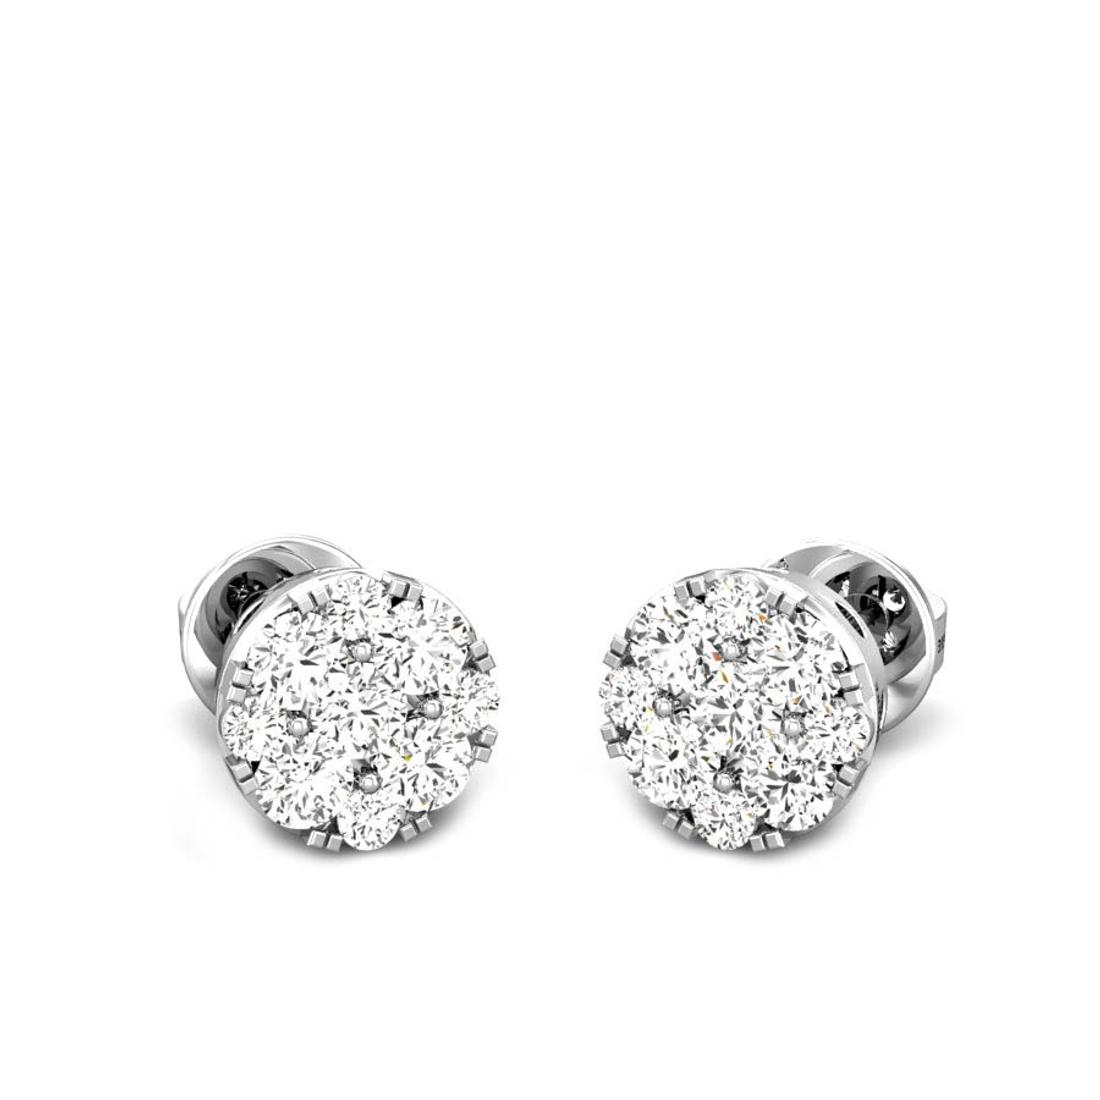 Candere by Kalyan Jewellers White Gold Lucrecia Ziah Diamond Earrings for Women (IGI Certified Diamonds)